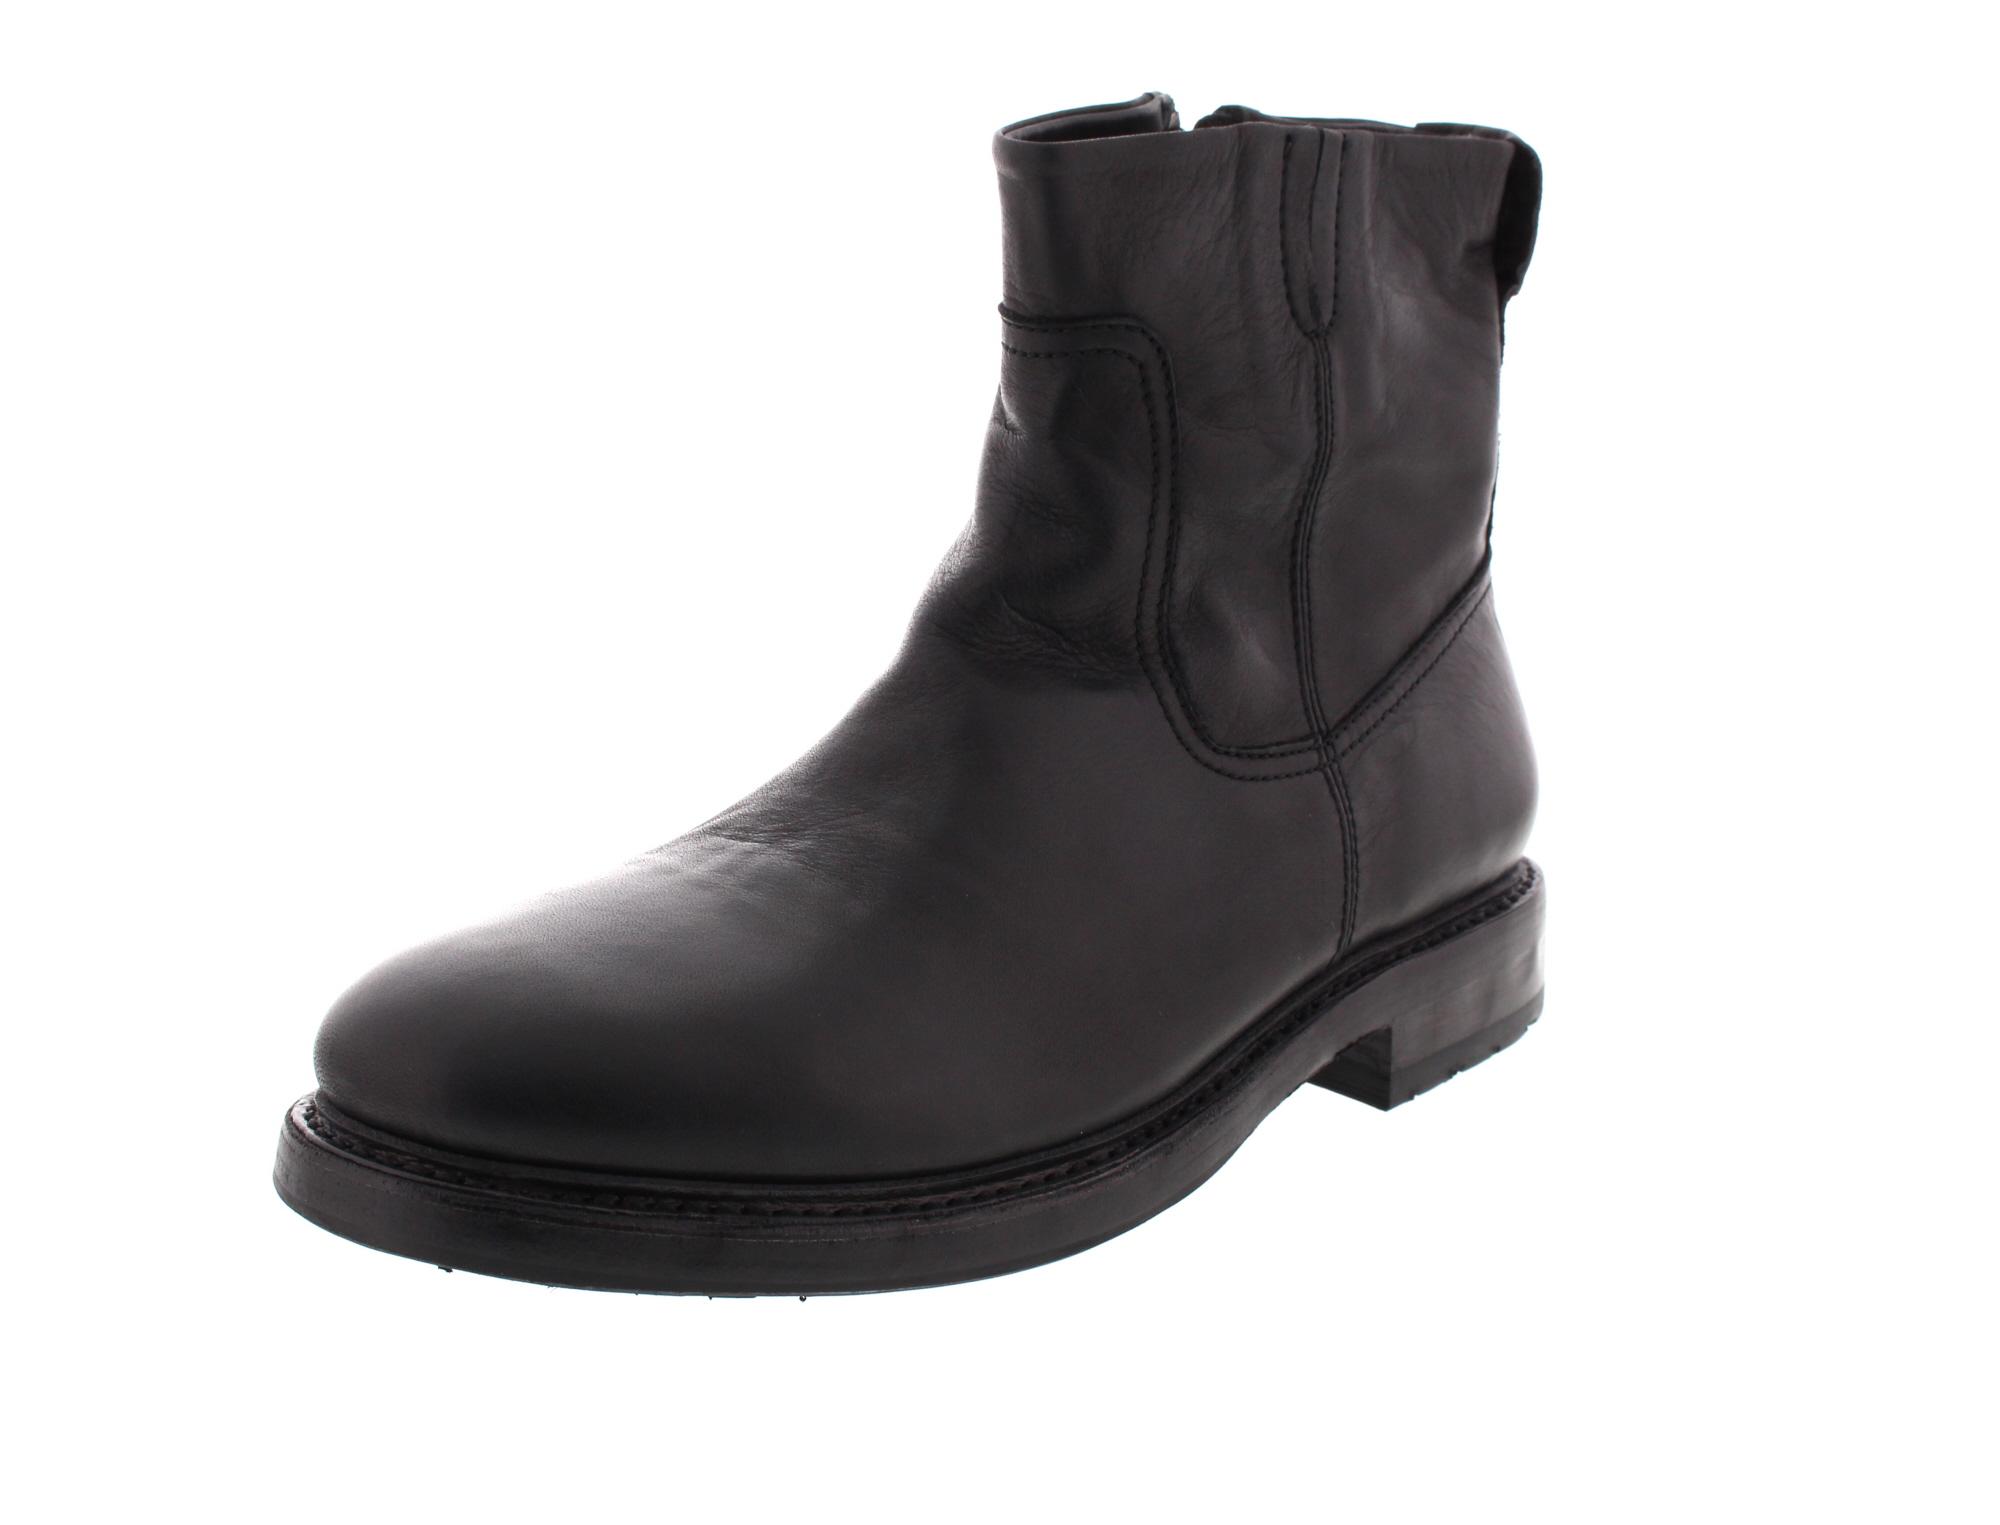 BLACKSTONE Herrenschuhe - Premium-Boots OM98 - black_0